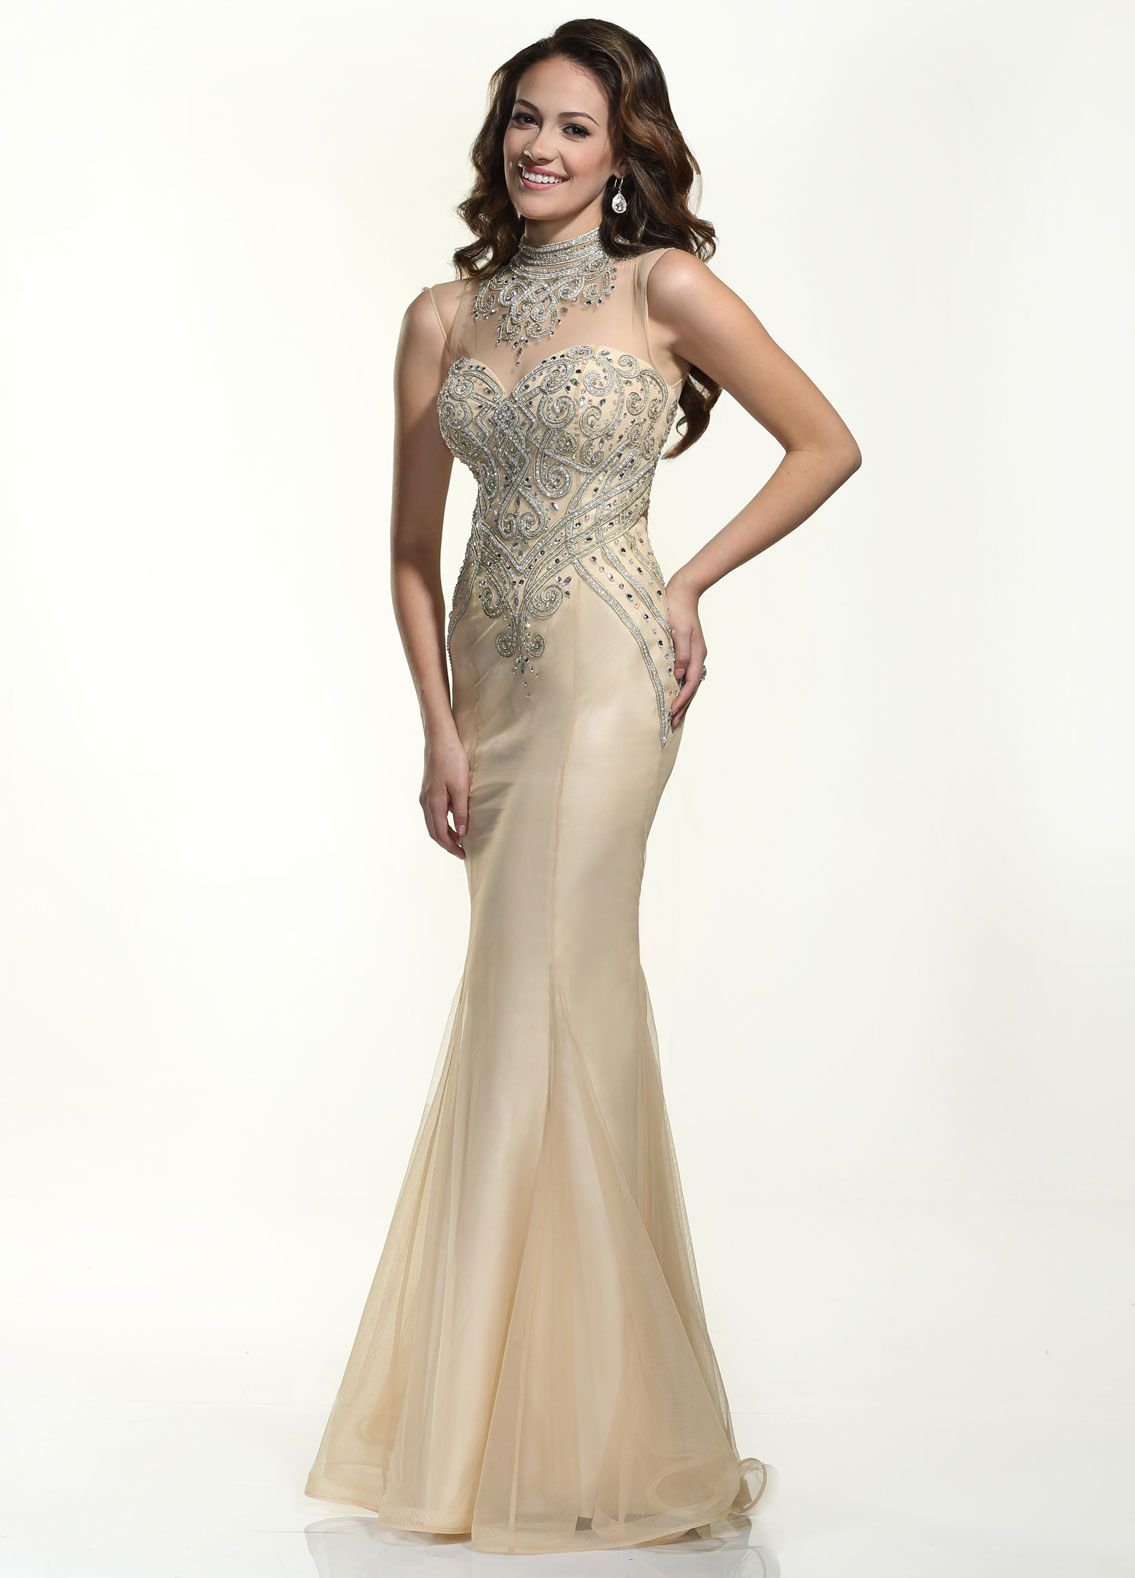 DE 35790 Nude/ Gold size 2   Xcite/ Xtreme/ Disney Enchanted gowns ...